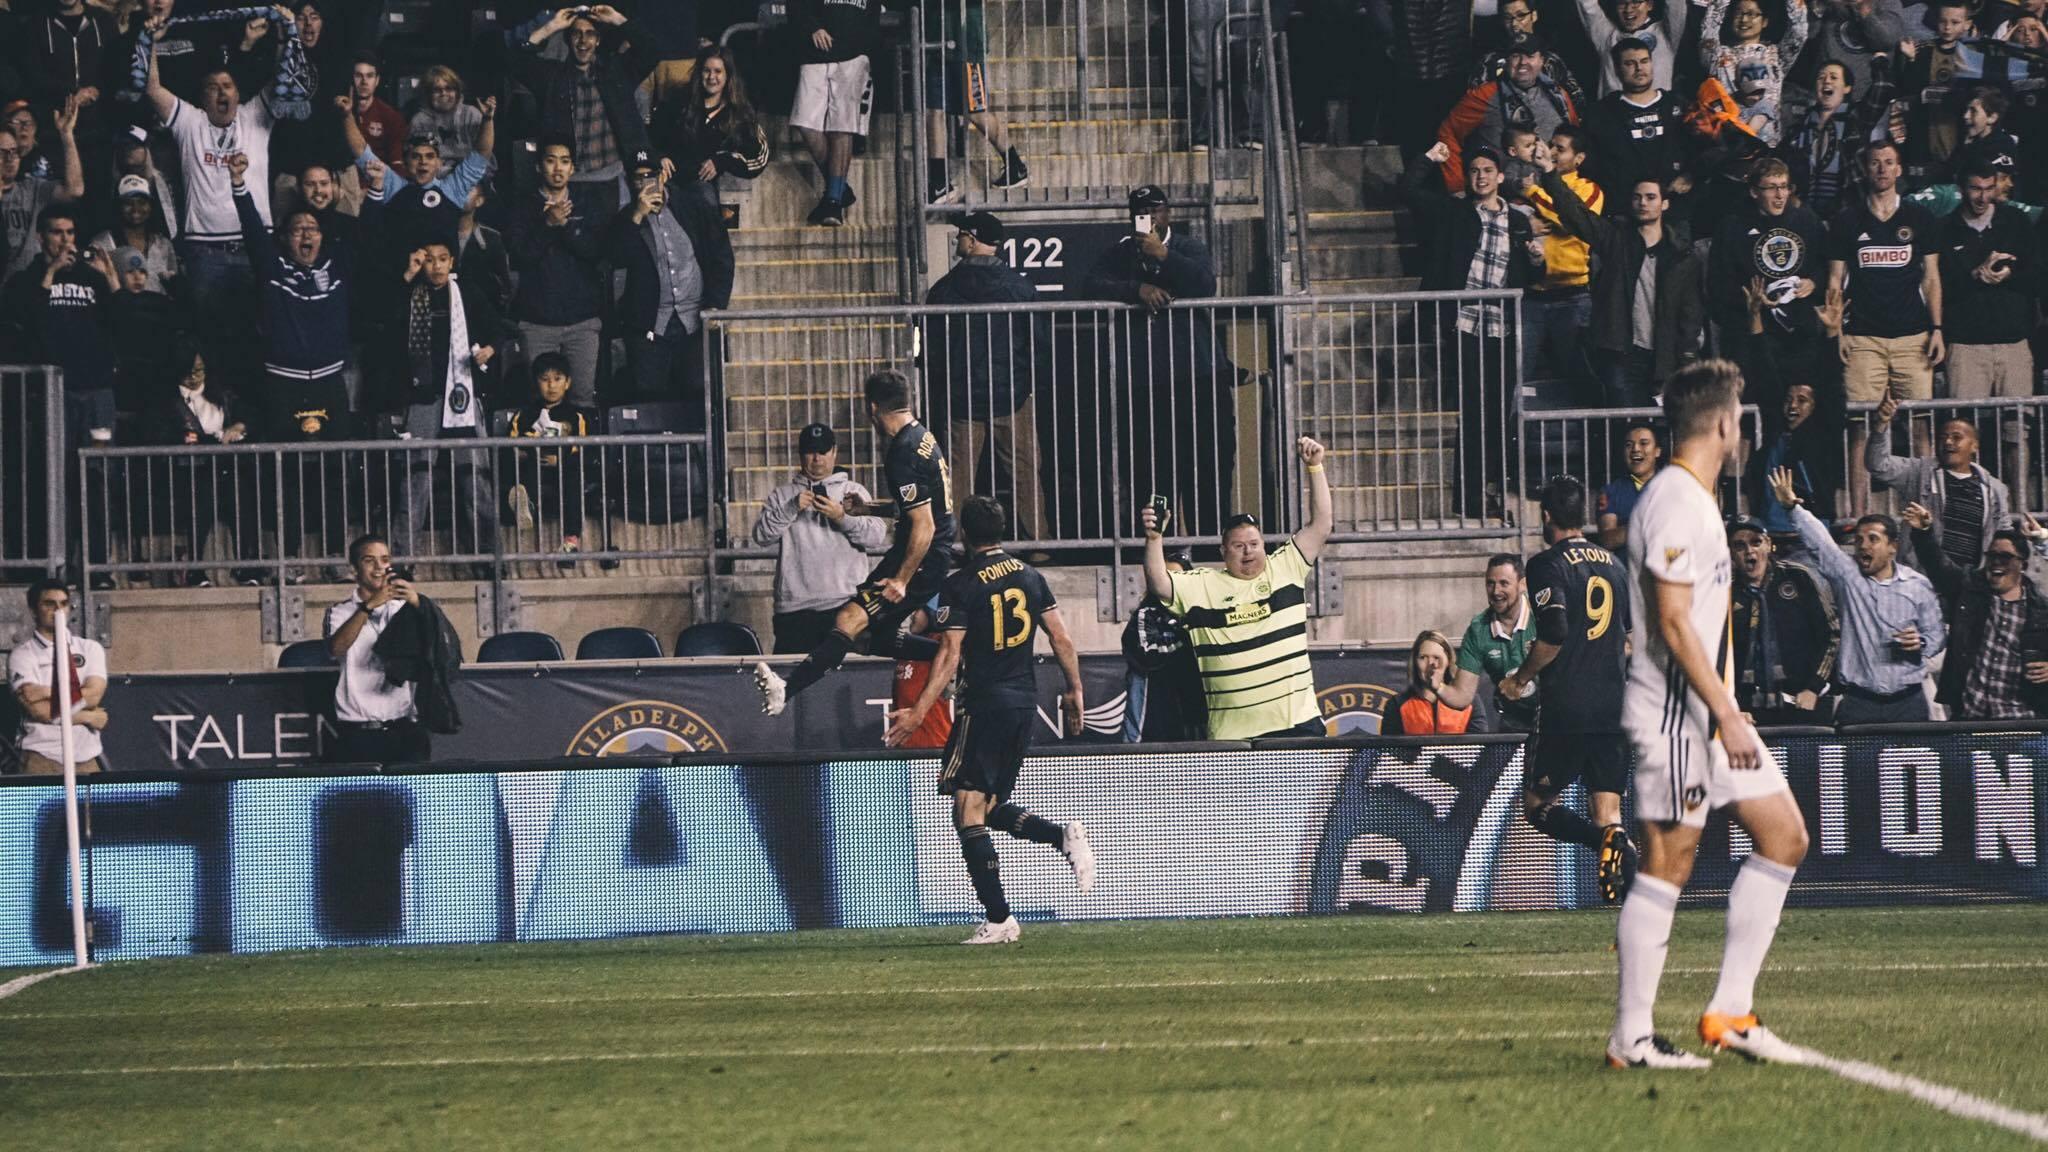 Keegan Rosenberry of the Philadelphia Union celebrates his first MLS goal against the LA Galaxy.